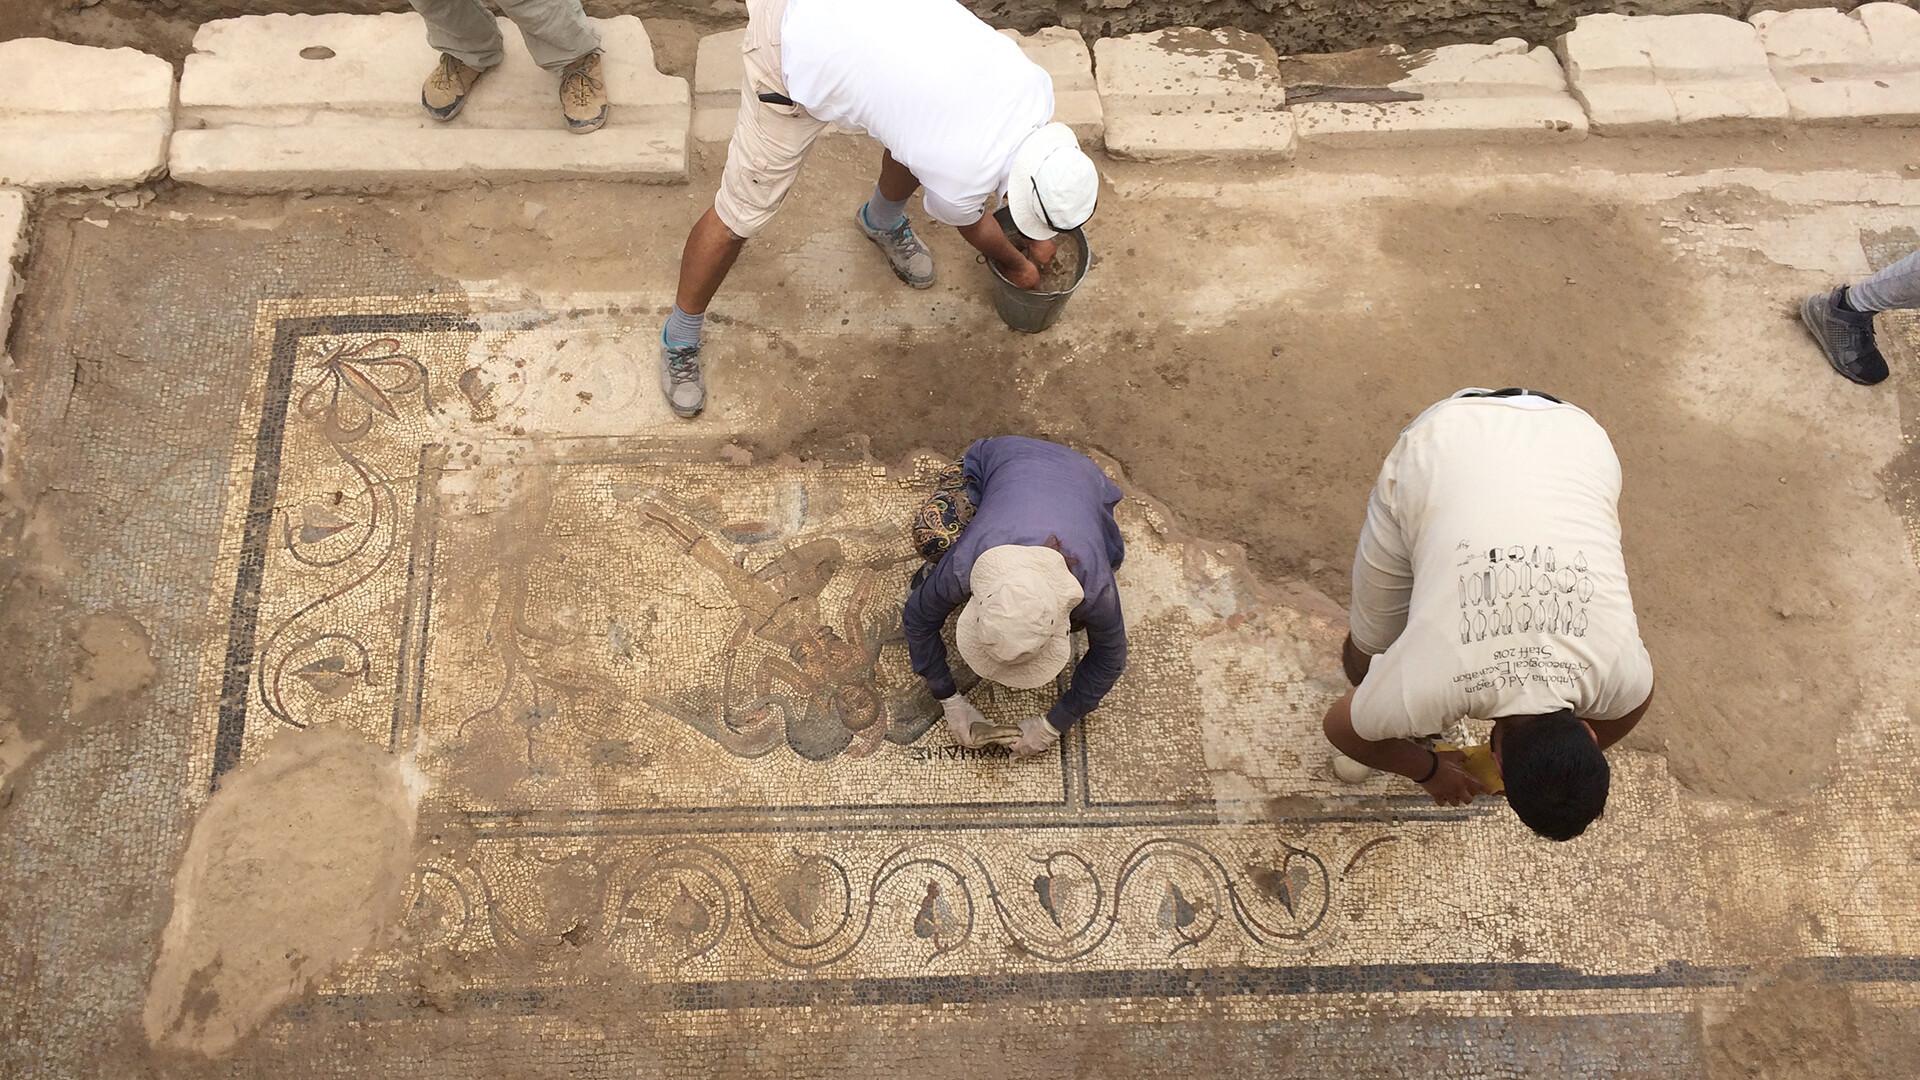 Nebraska team discovers 'extraordinary' Roman mosaic in Turkey